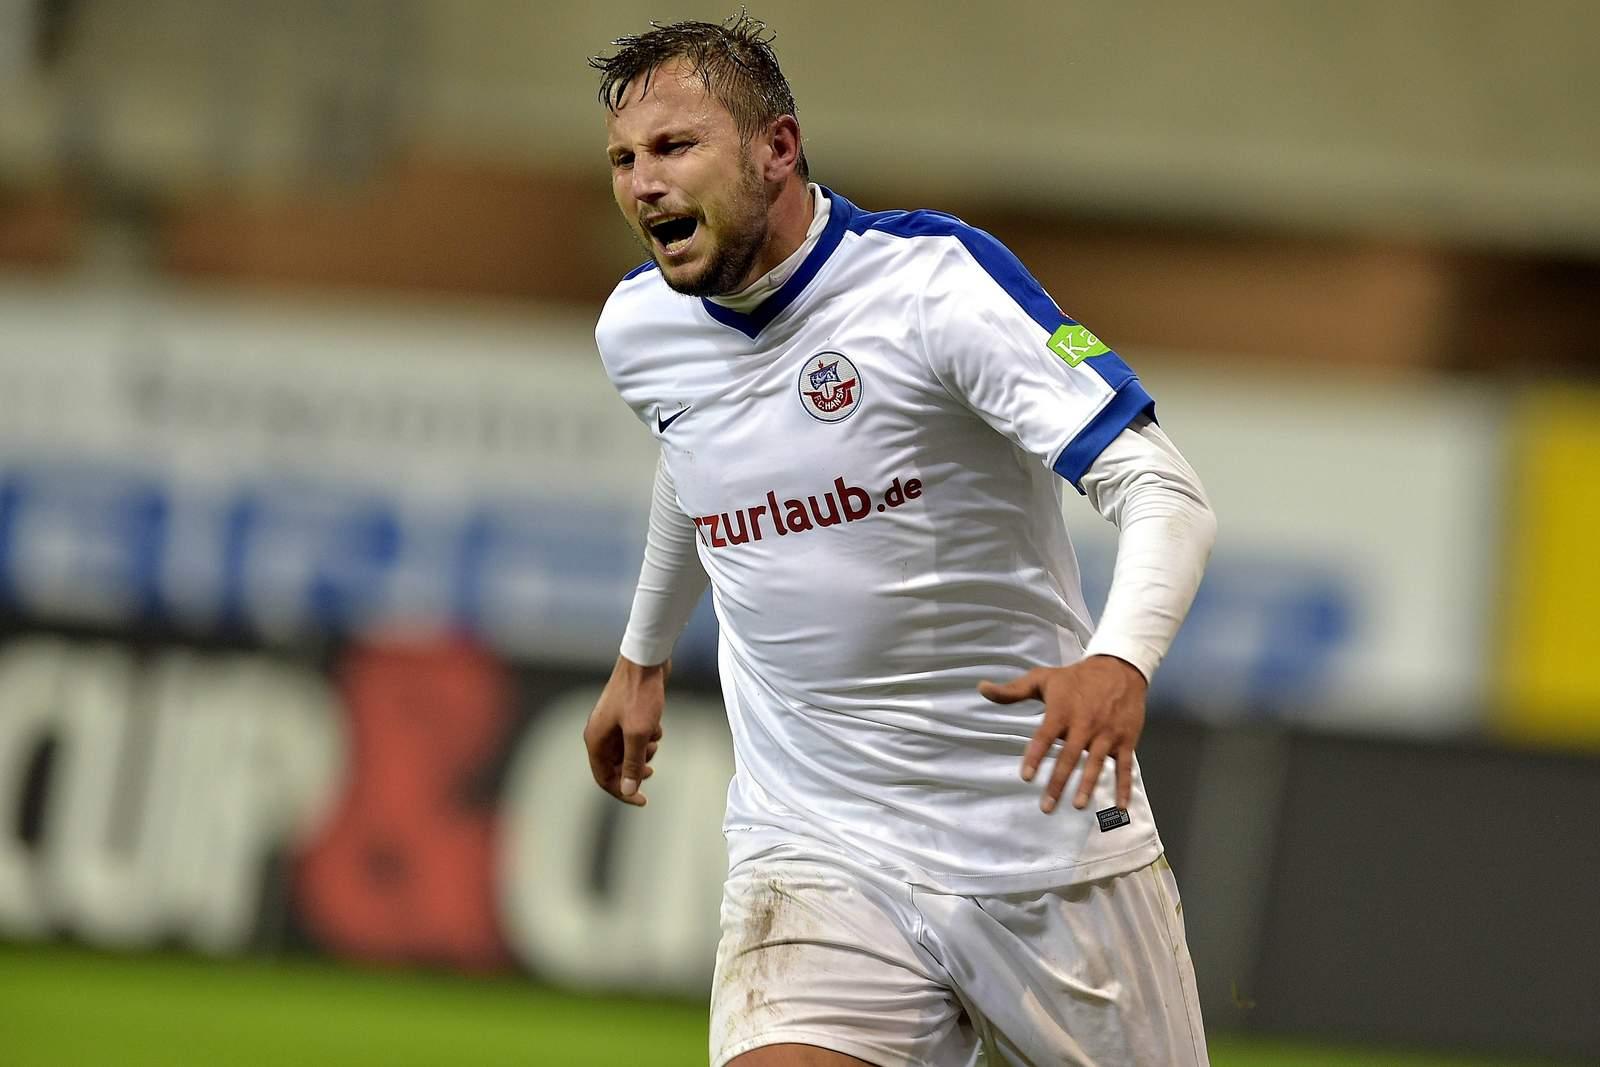 Marcel Ziemer vom FC Hansa Rostock beim Torjubel